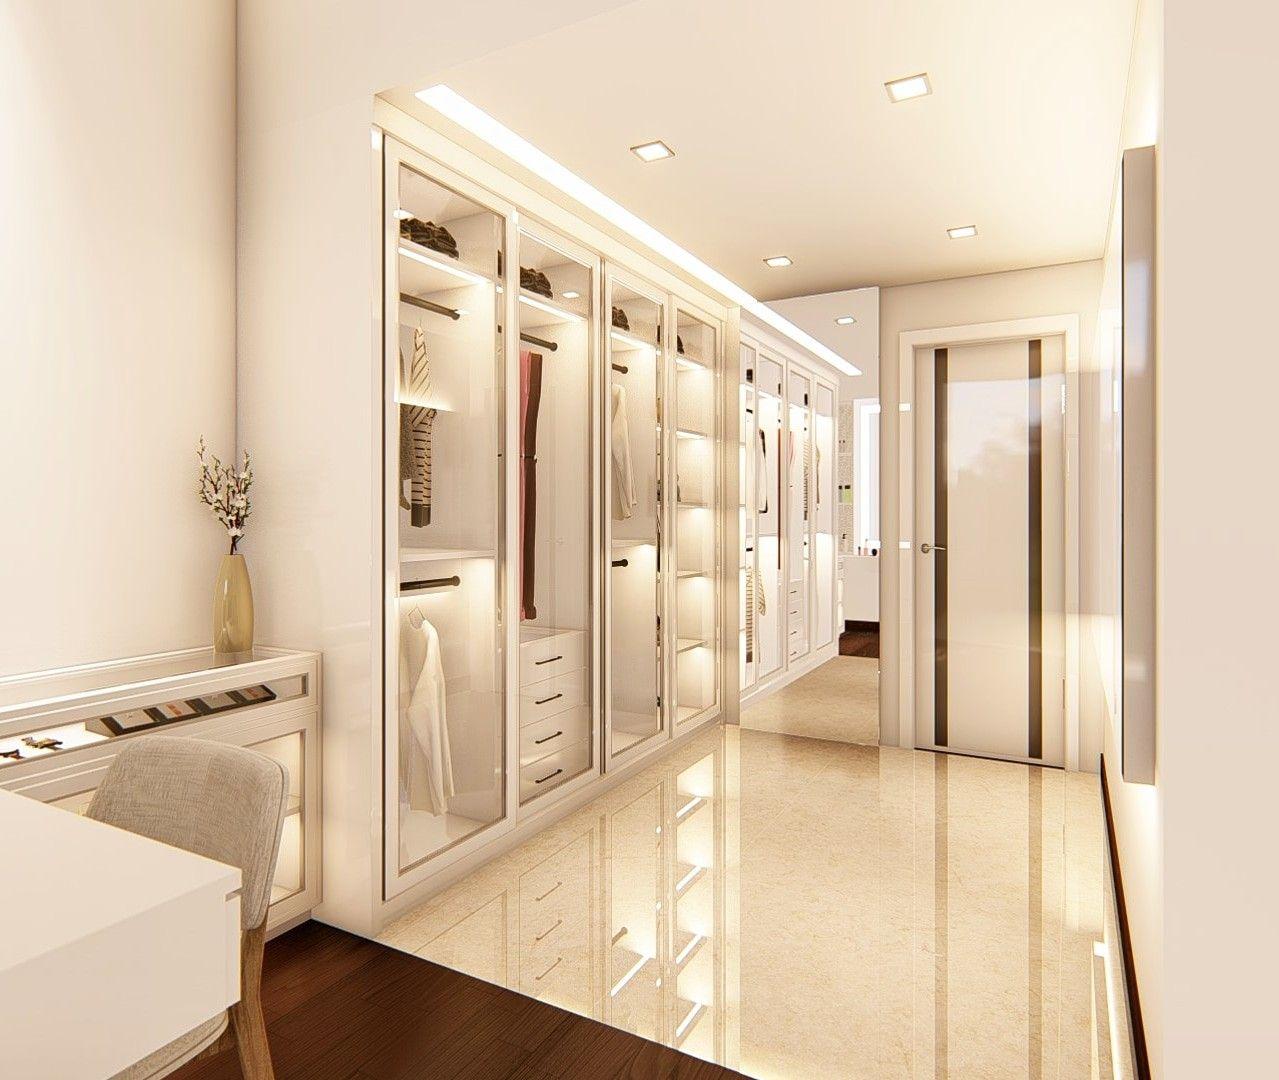 Jasa arsitek interior batam arsitek batam desain interior batam interior design batam modern design modern architecture wardrobe idea